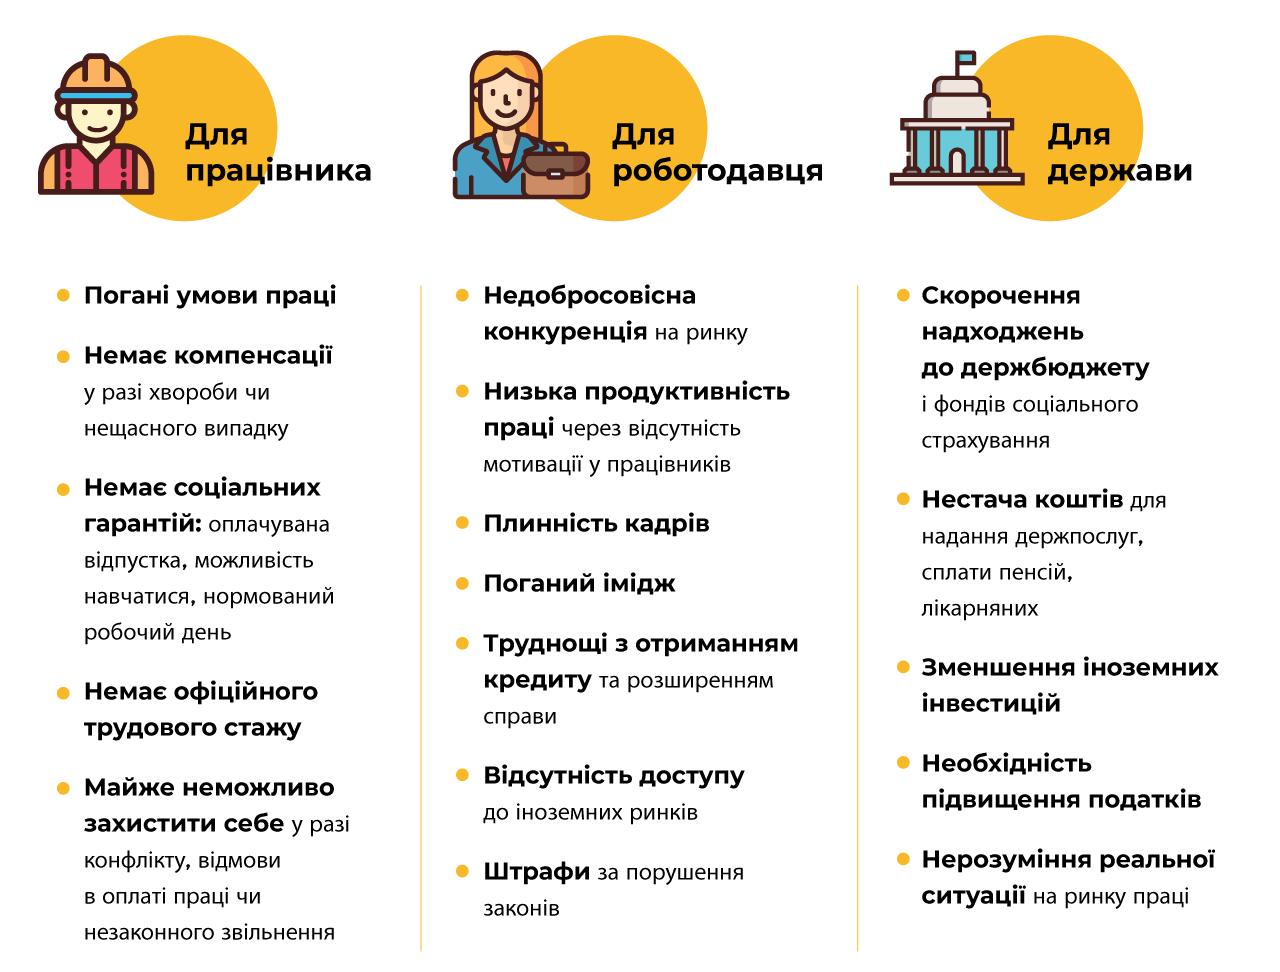 https://dsp.gov.ua/wp-content/uploads/2020/01/ilo_infographic1_4_ukr-e1579623905890.png